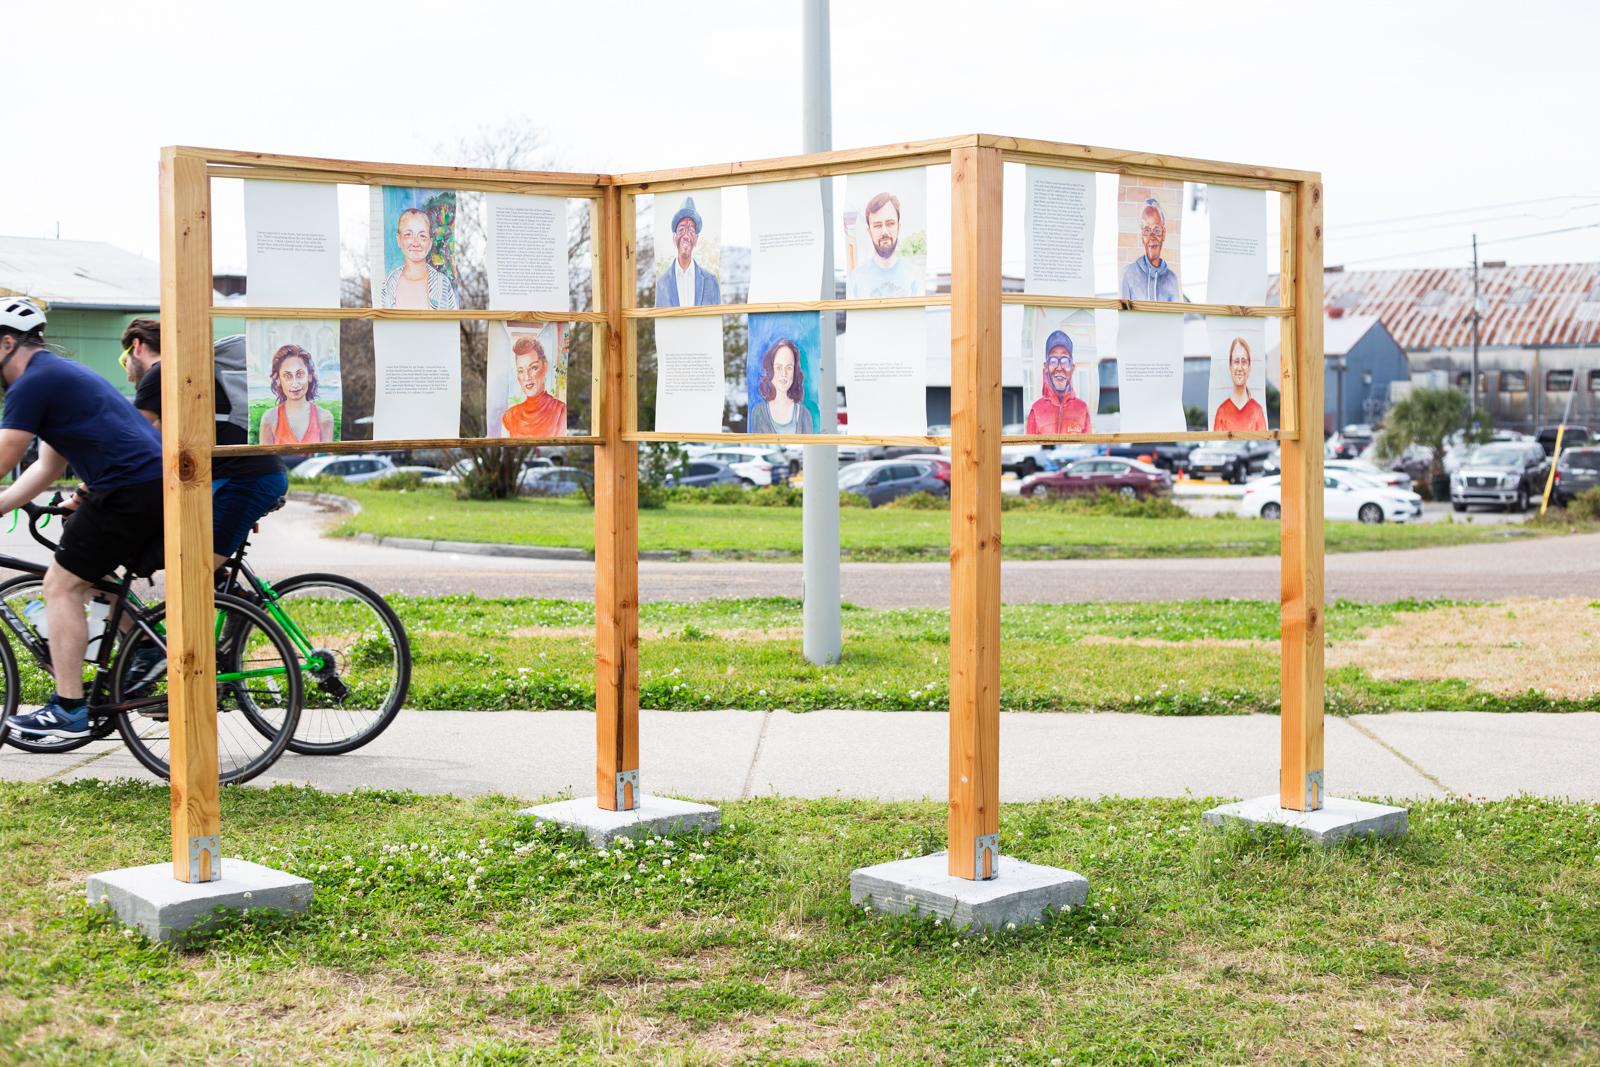 L_Jeffrey_Andrews_New_Orleans_Paper_Monuments_Installation_Bayou_St_John_02.jpg